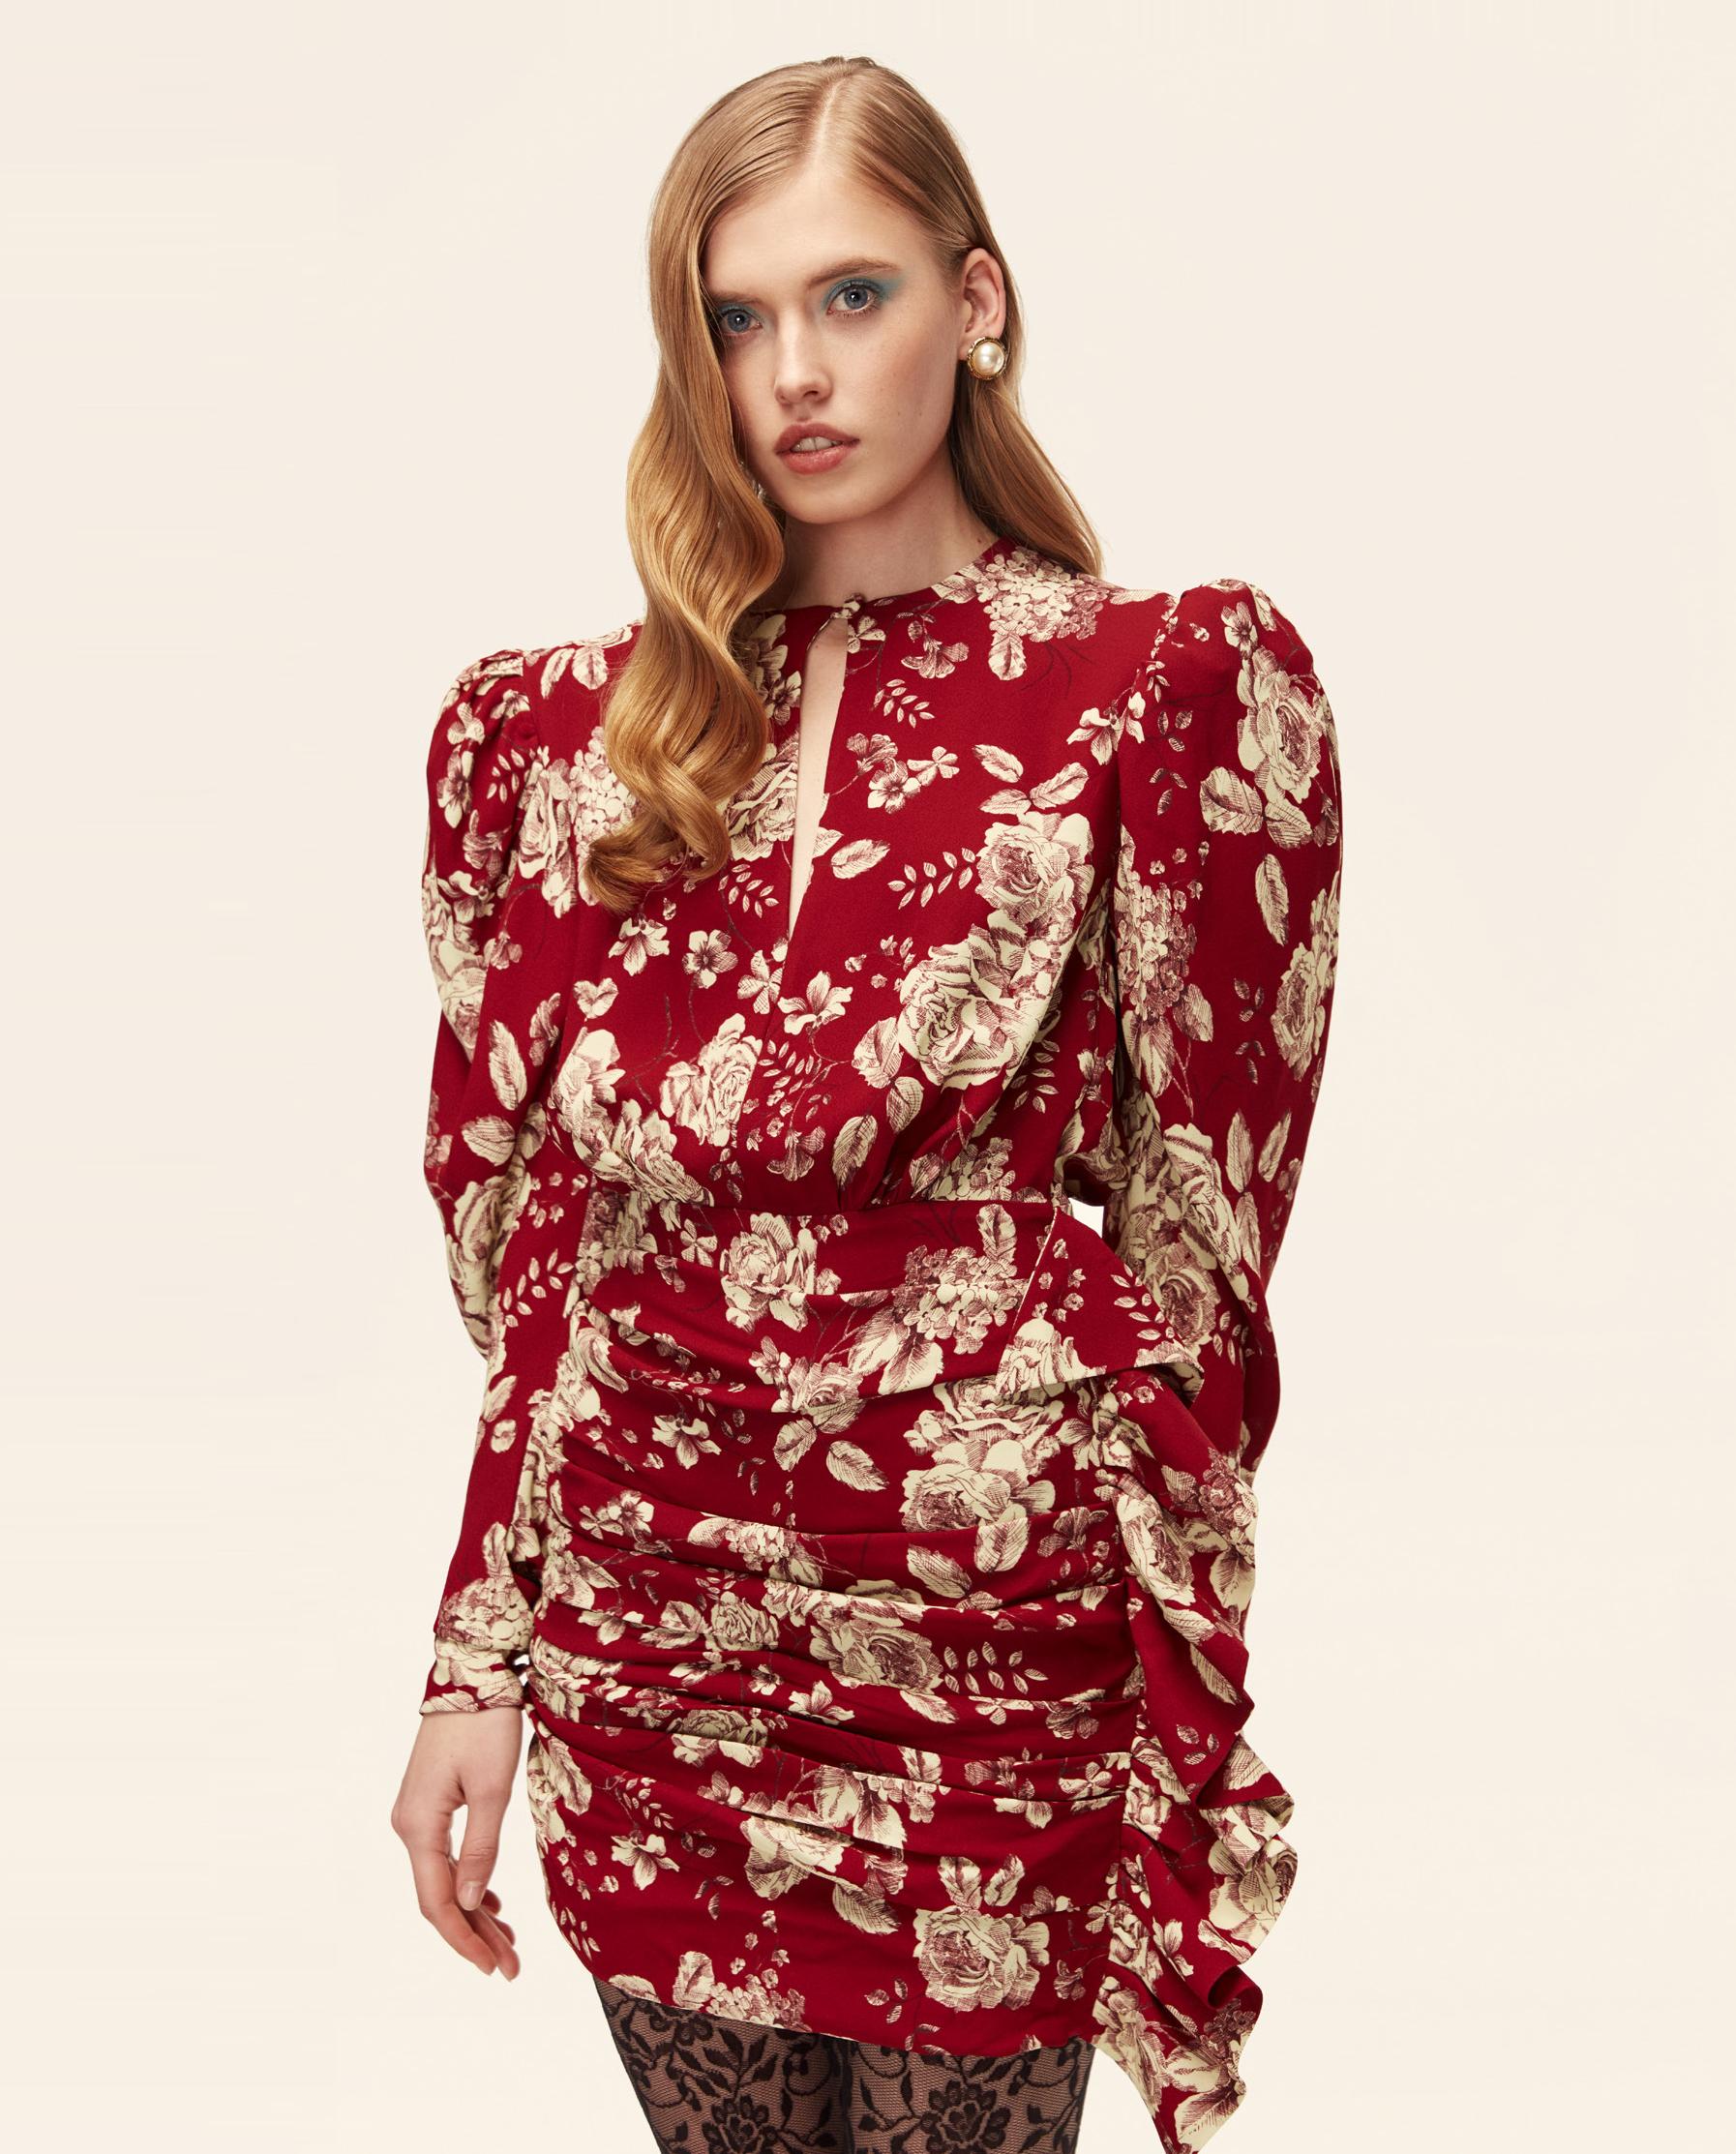 bordowa sukienka w kwiaty Marianna Senchina MS/FW2021-314D BORDEAUX